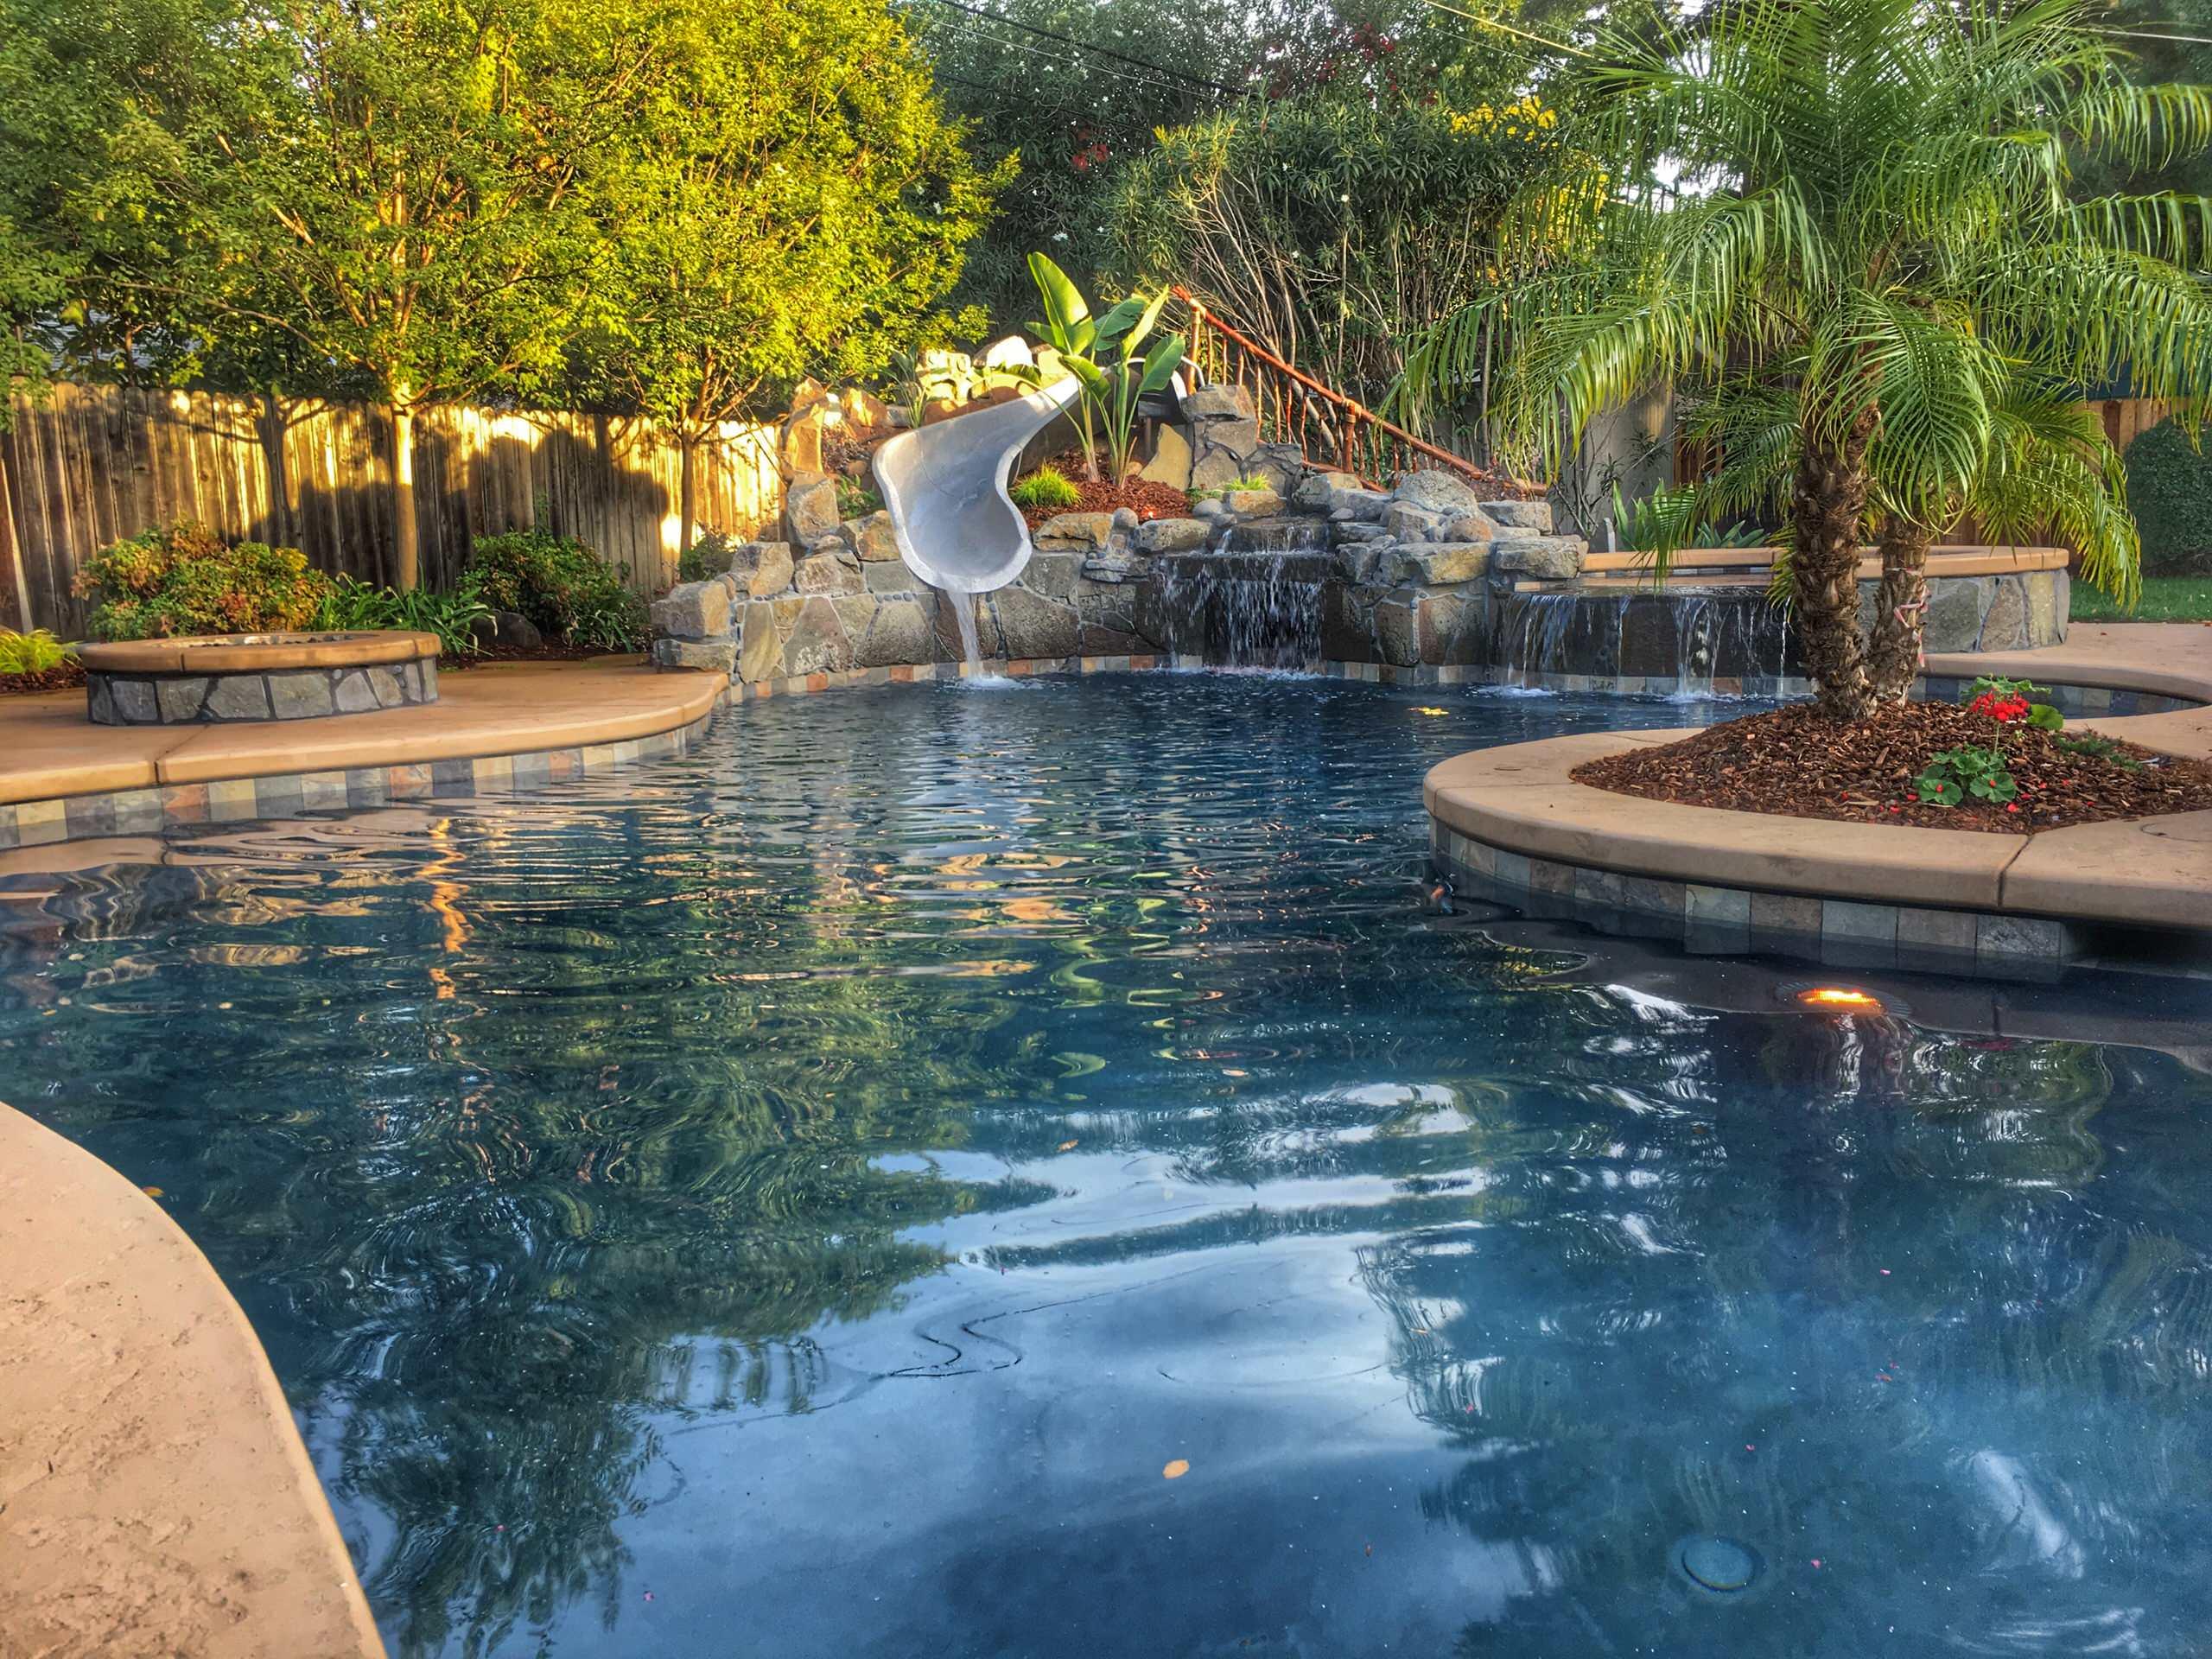 Private Paradise, Arden Park (Sacramento)